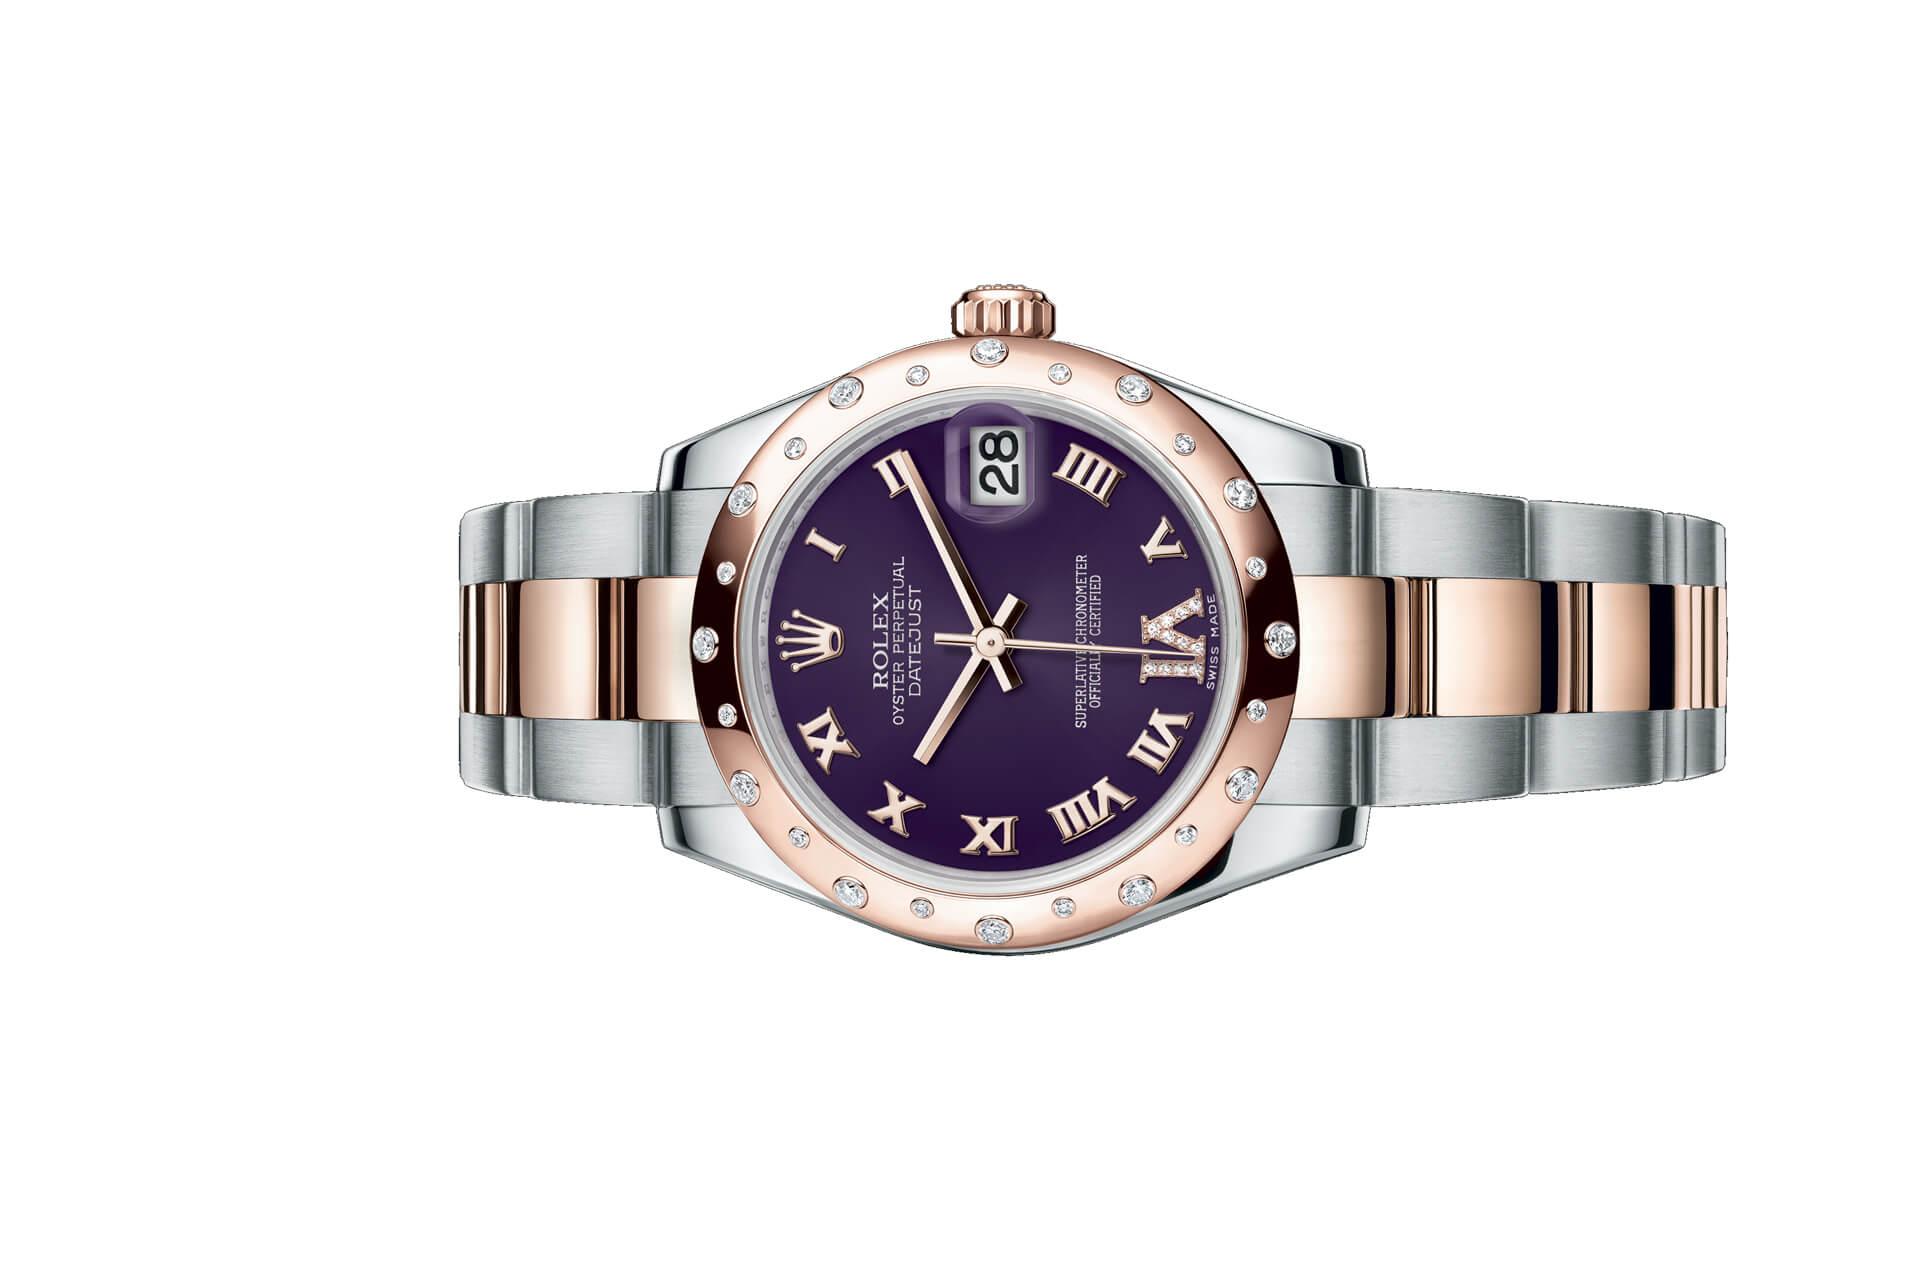 Đồng hồ Rolex Lady-Datejust 178341